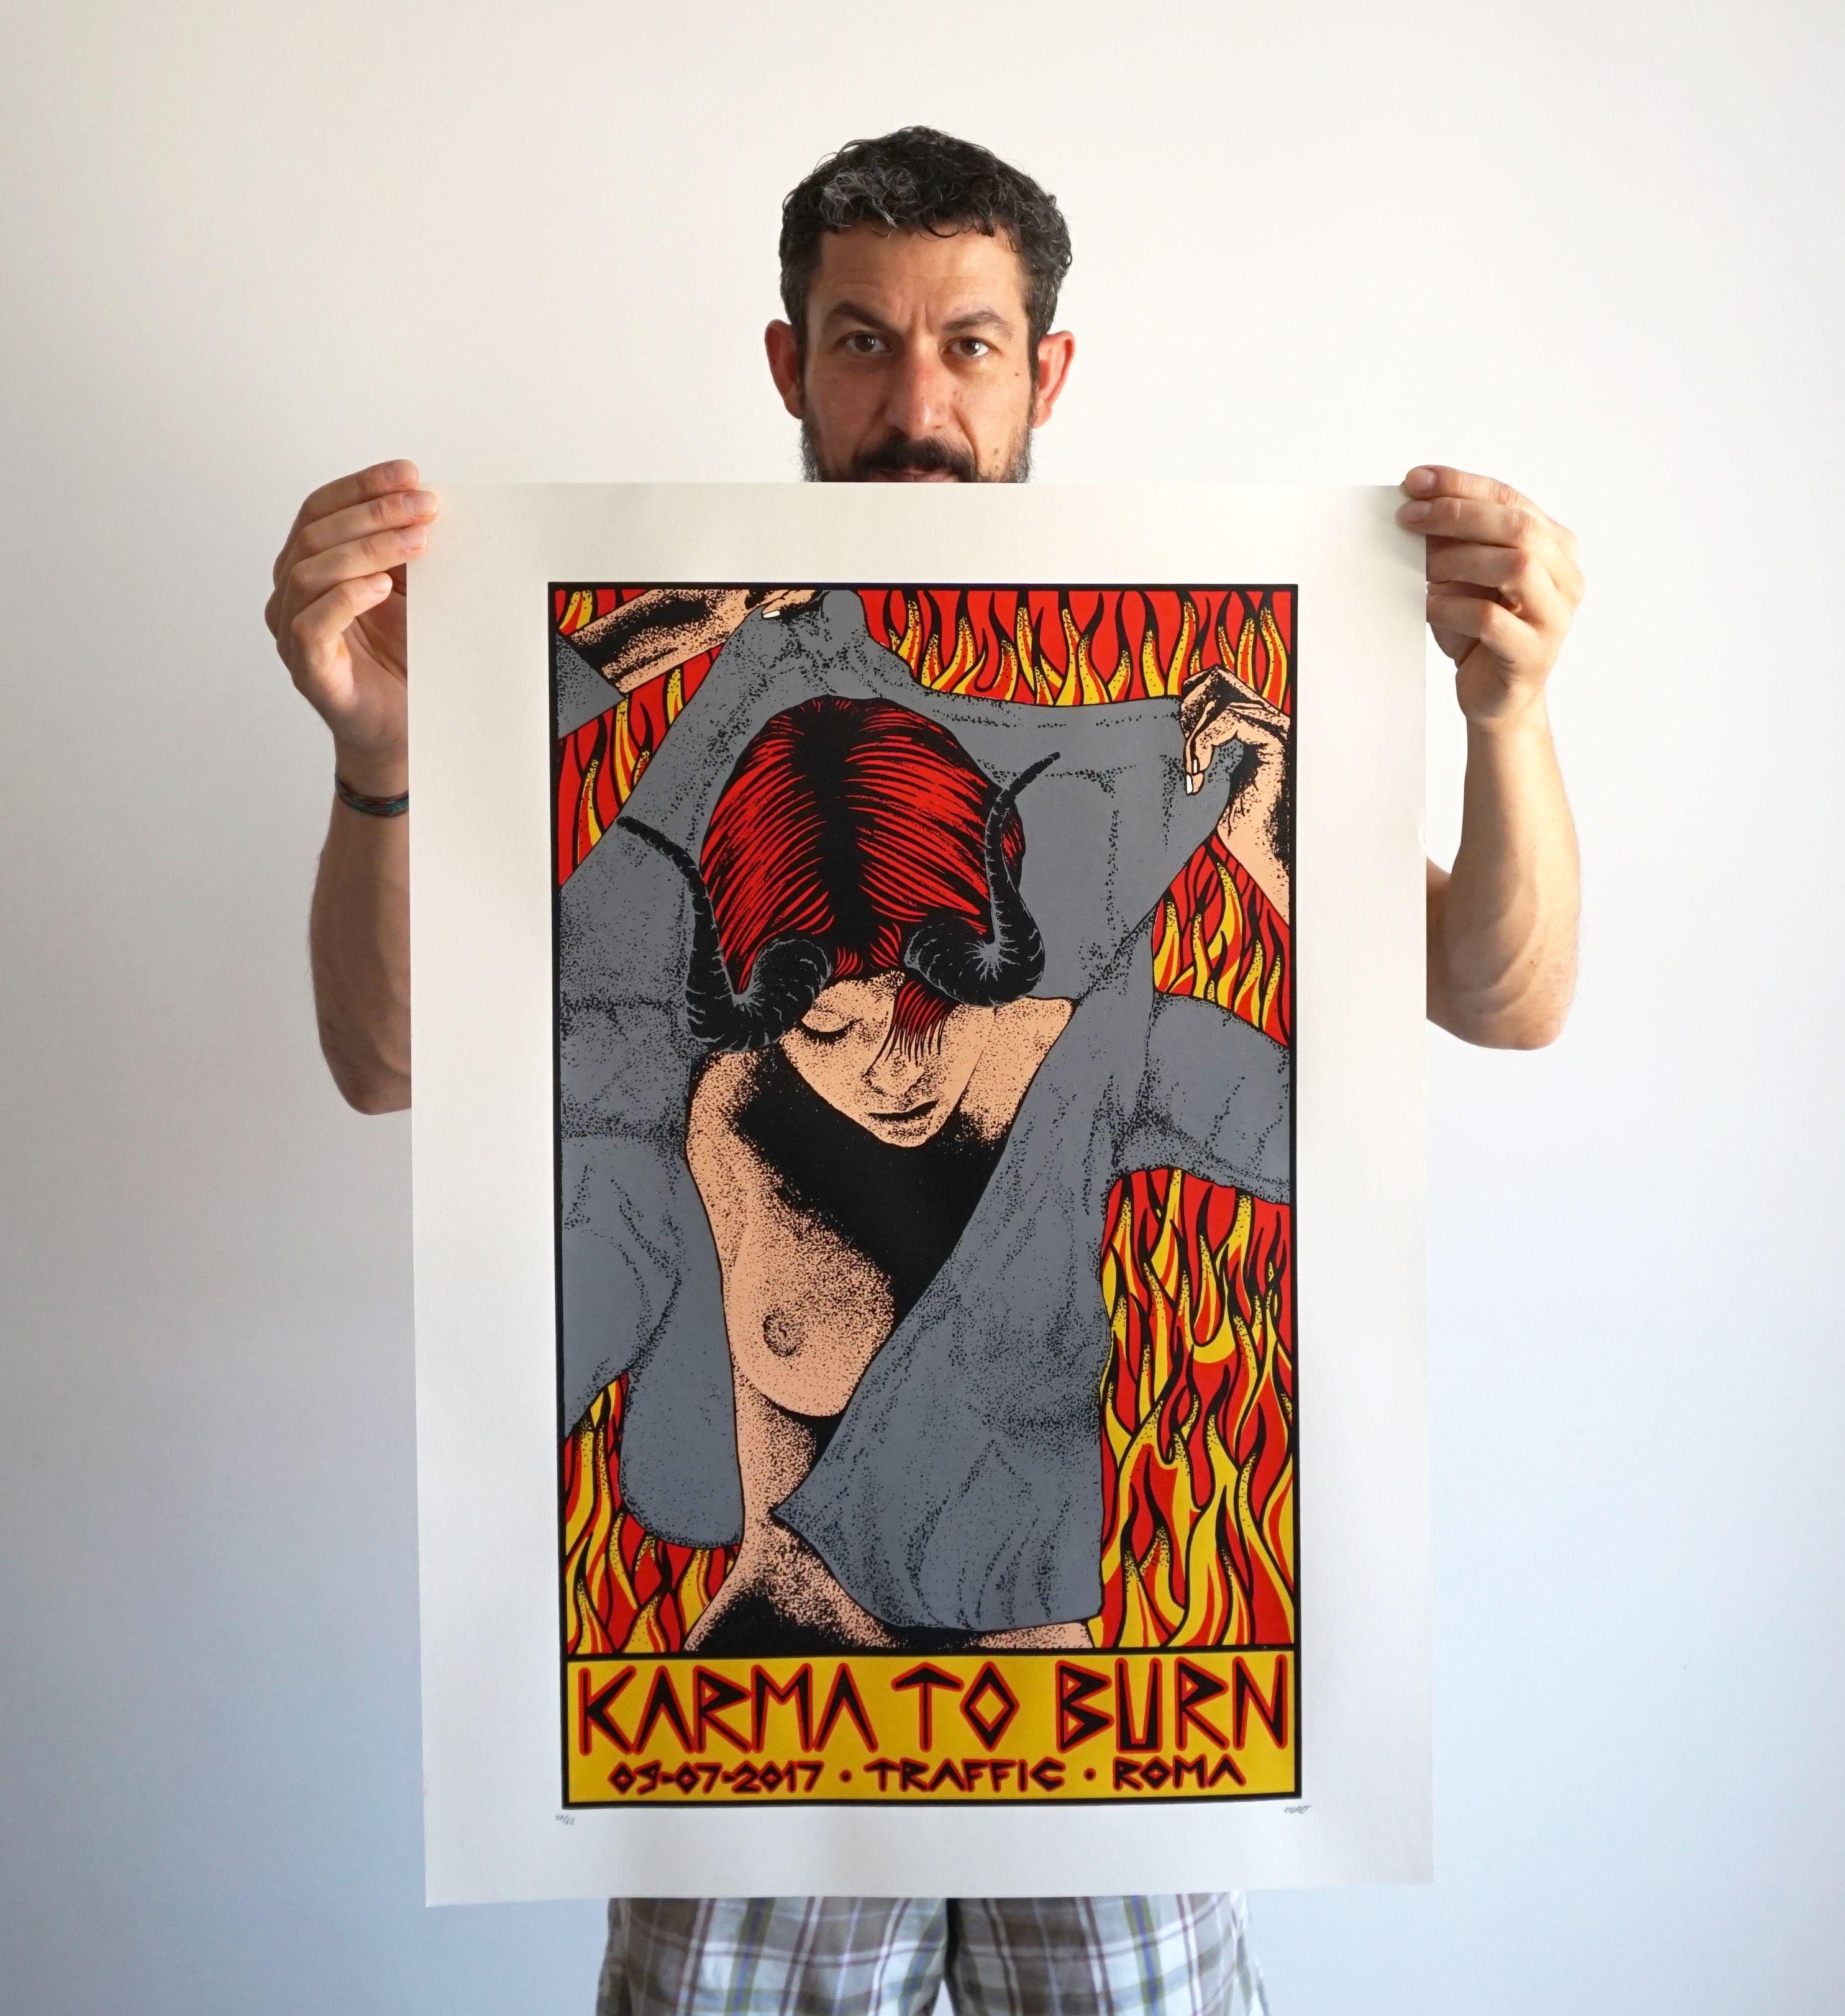 KARMA TO BURN // Gigposter #gig #poster #art #print #karmatoburn